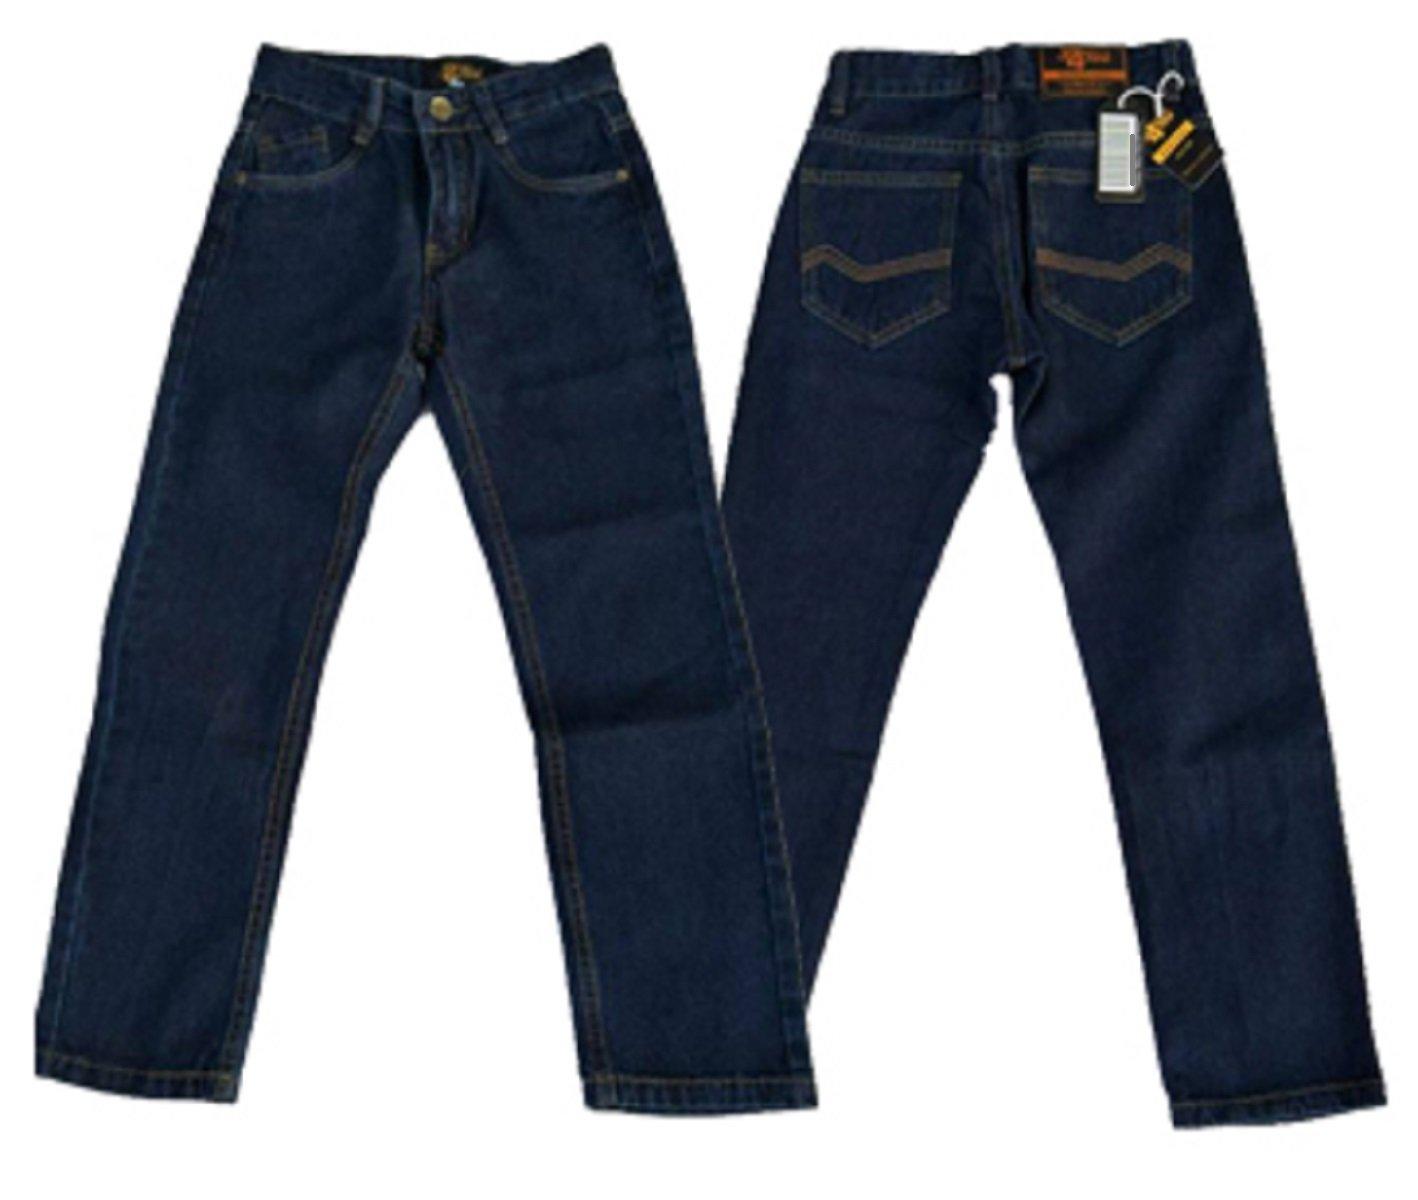 justfound4u Designer Boys Jeans Adjustable Waist Trousers Black Blue Denim Wash Age 2 3 4 5 6 7 8 9 10 11 12 13 14 15 16 Years Justfound4You